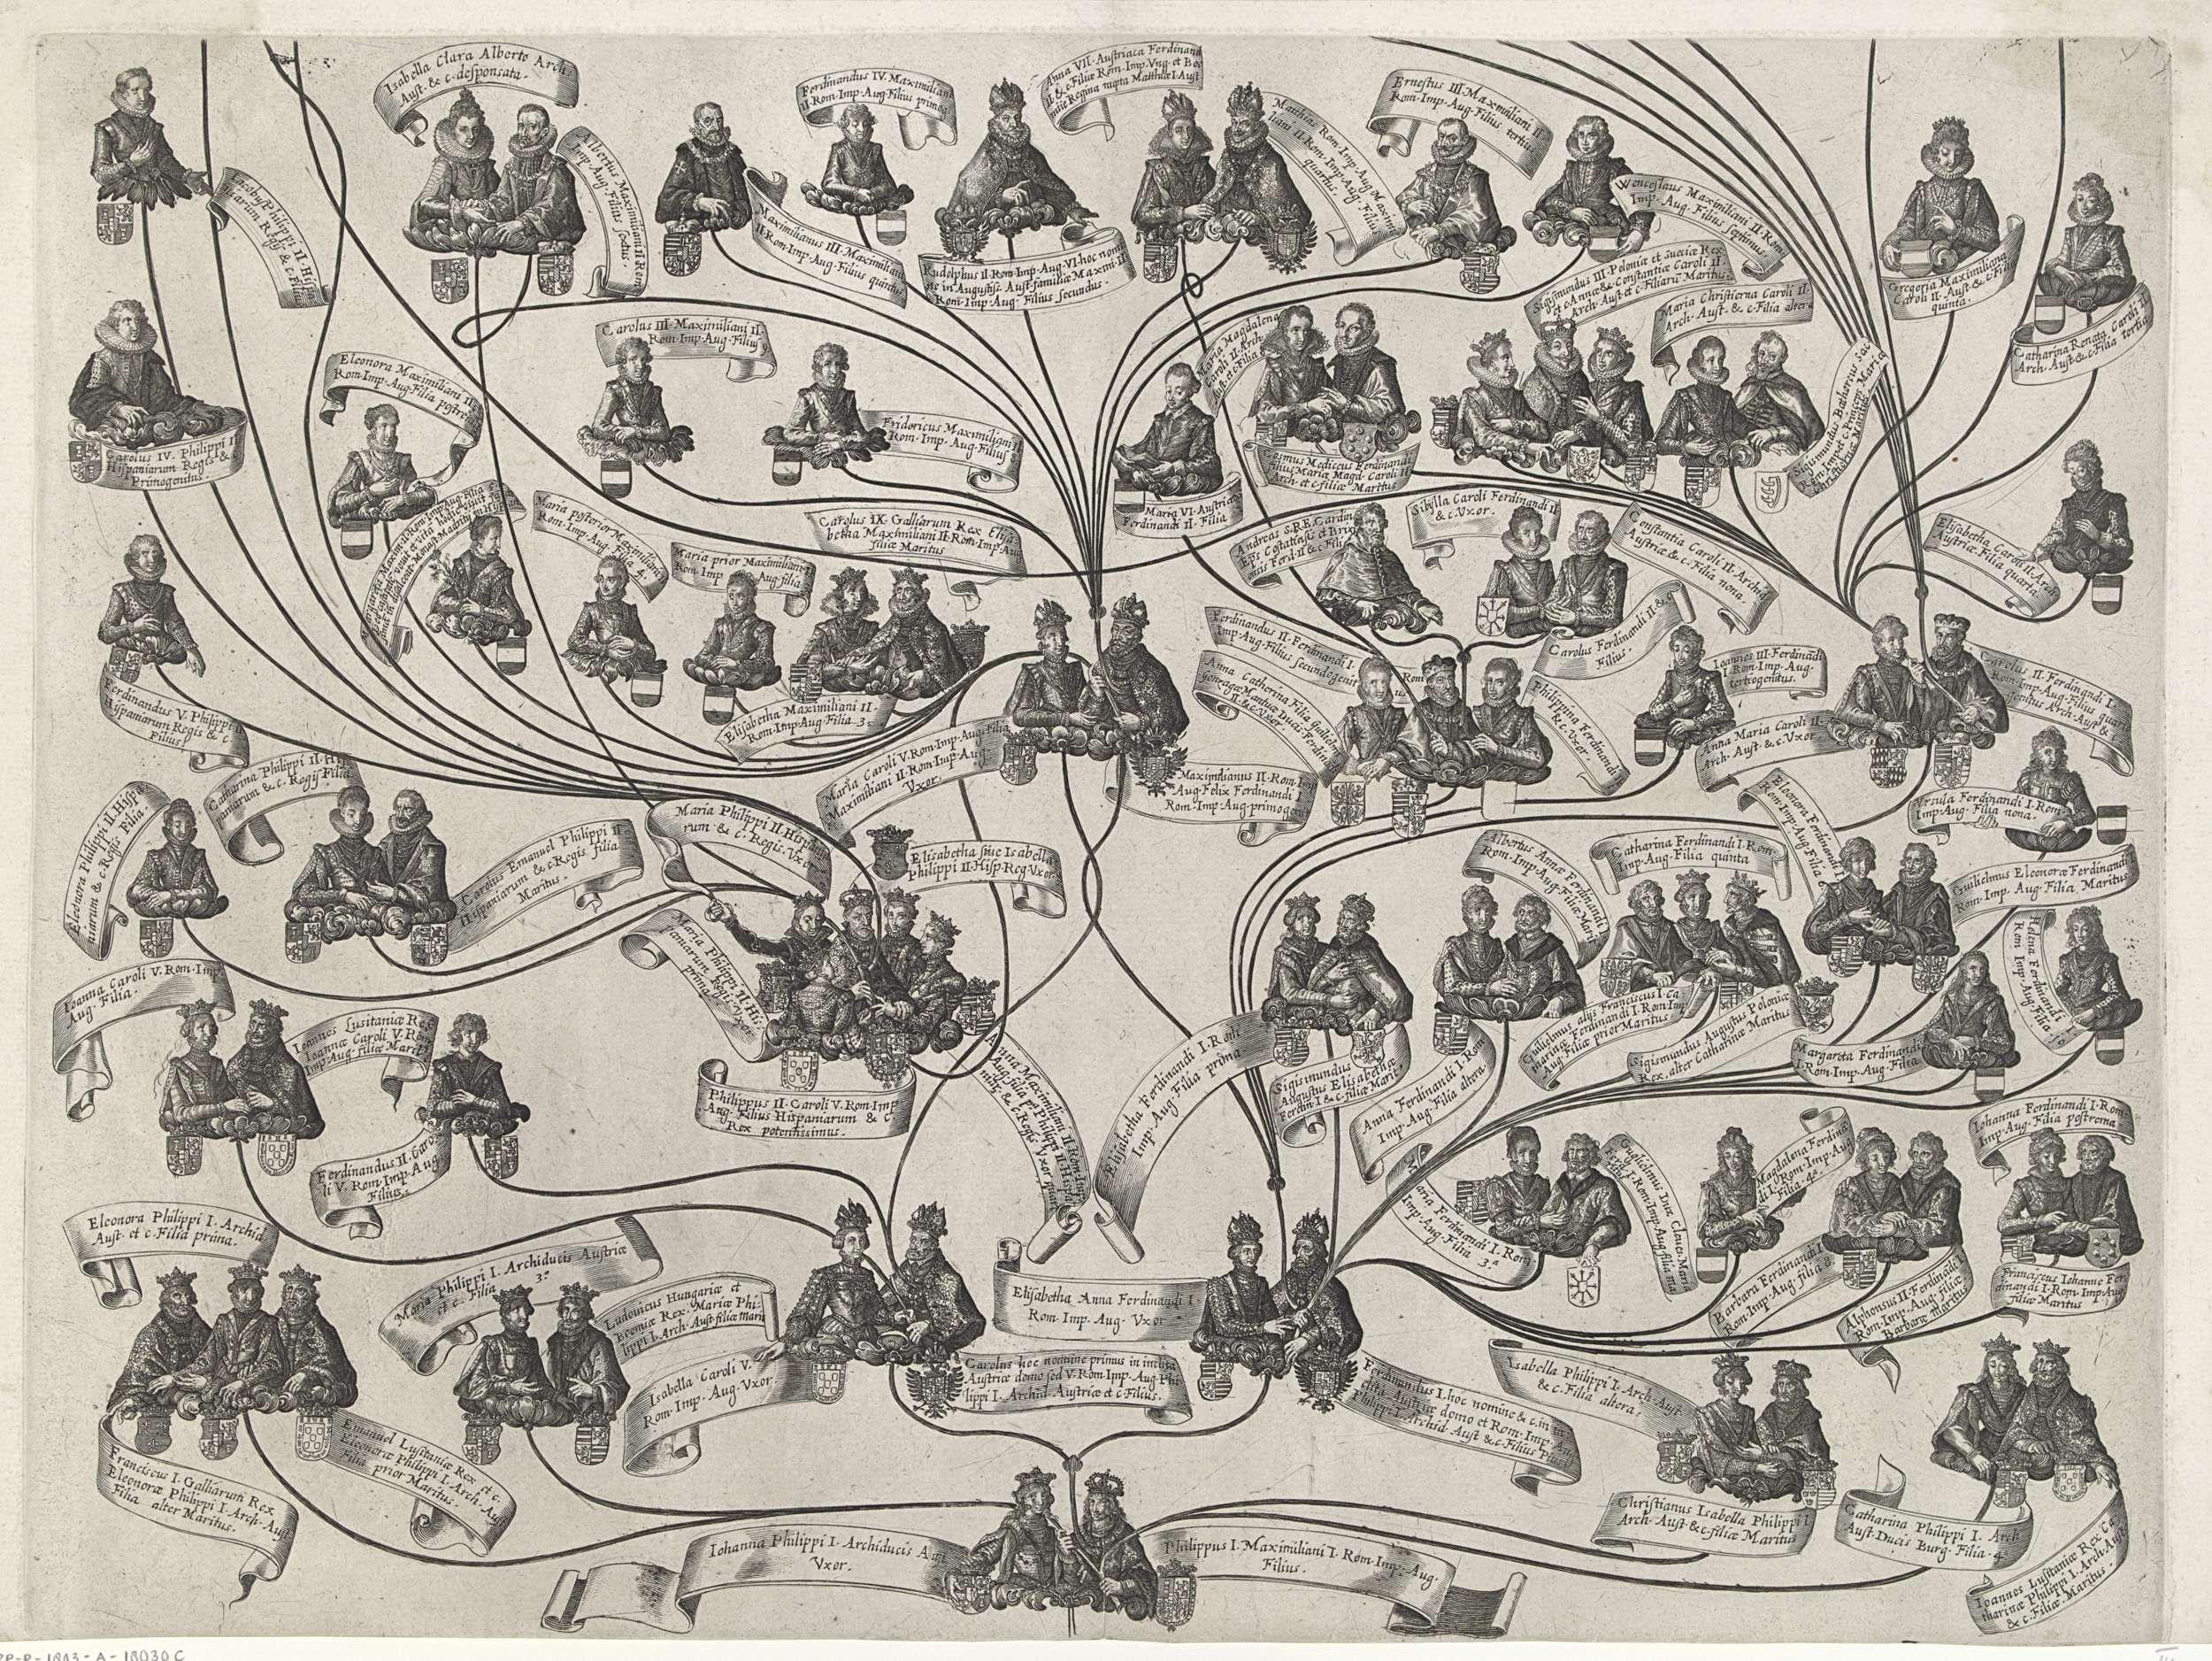 Aegidius Sadeler | Stamboom van het Habsburgse huis (derde blad), Aegidius Sadeler, Marcus Christoph Sadeler, Ferdinand II (Duits keizer), 1629 | Stamboom van het Habsburgse huis met onderaan Filips I.